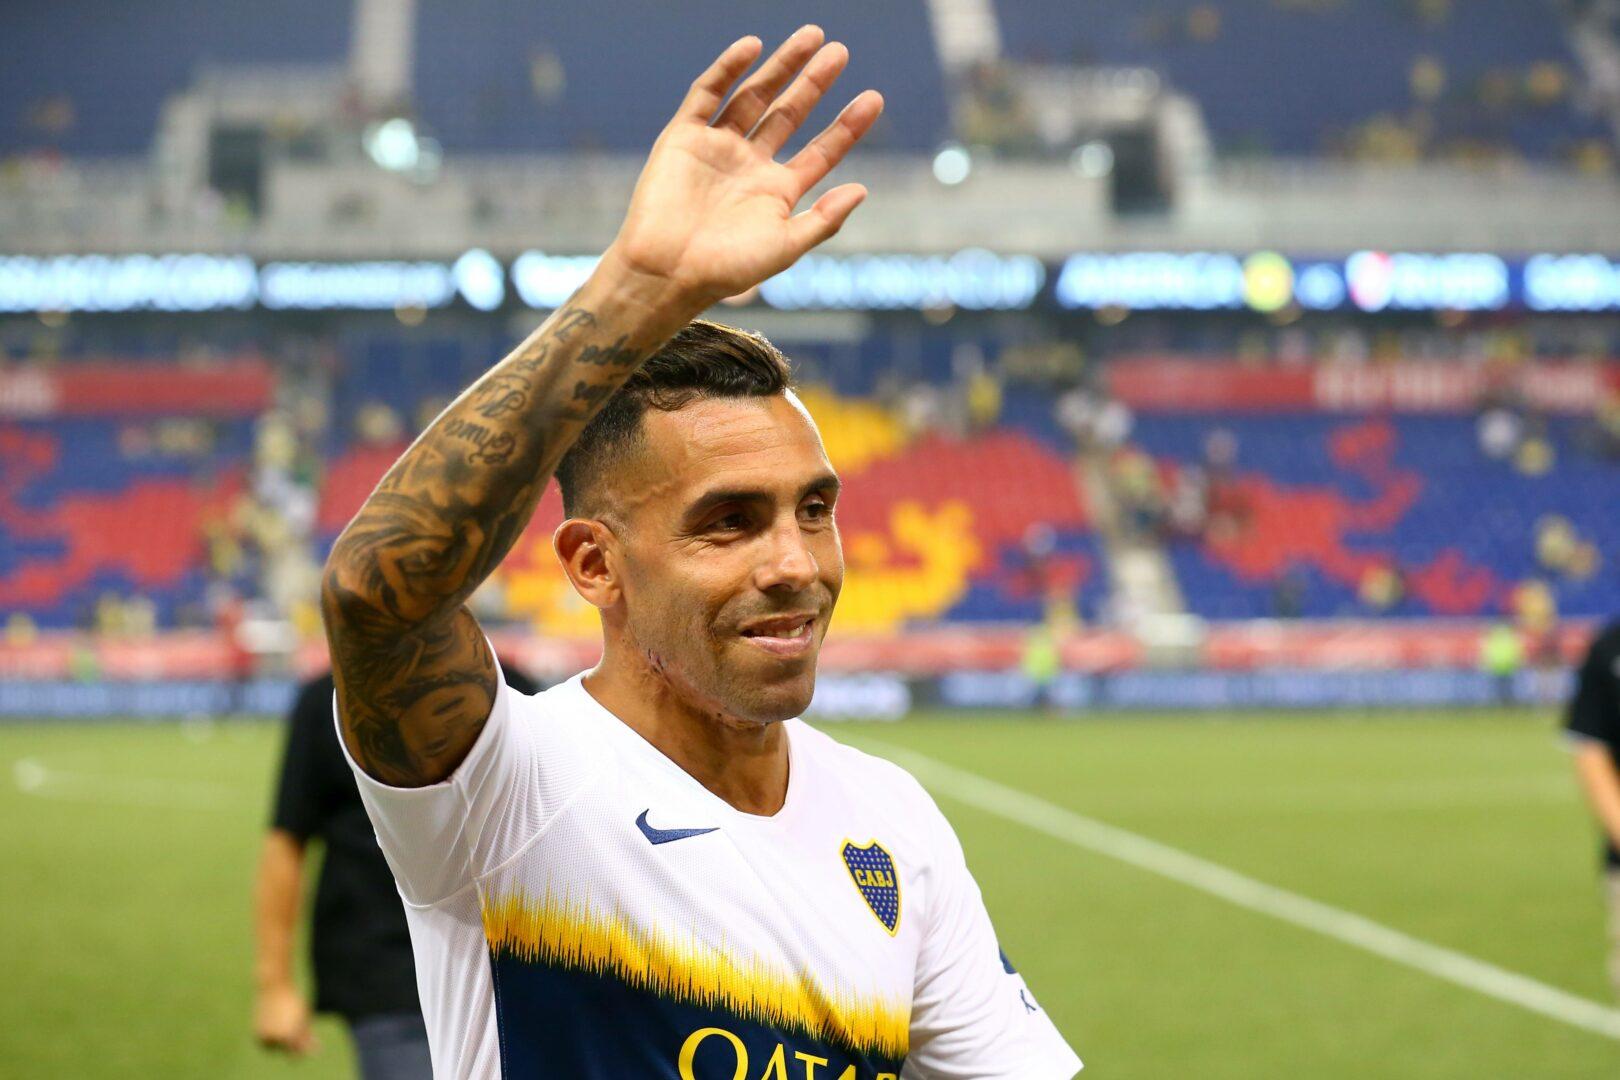 Carlos Tevez (Boca Juniors) winkt